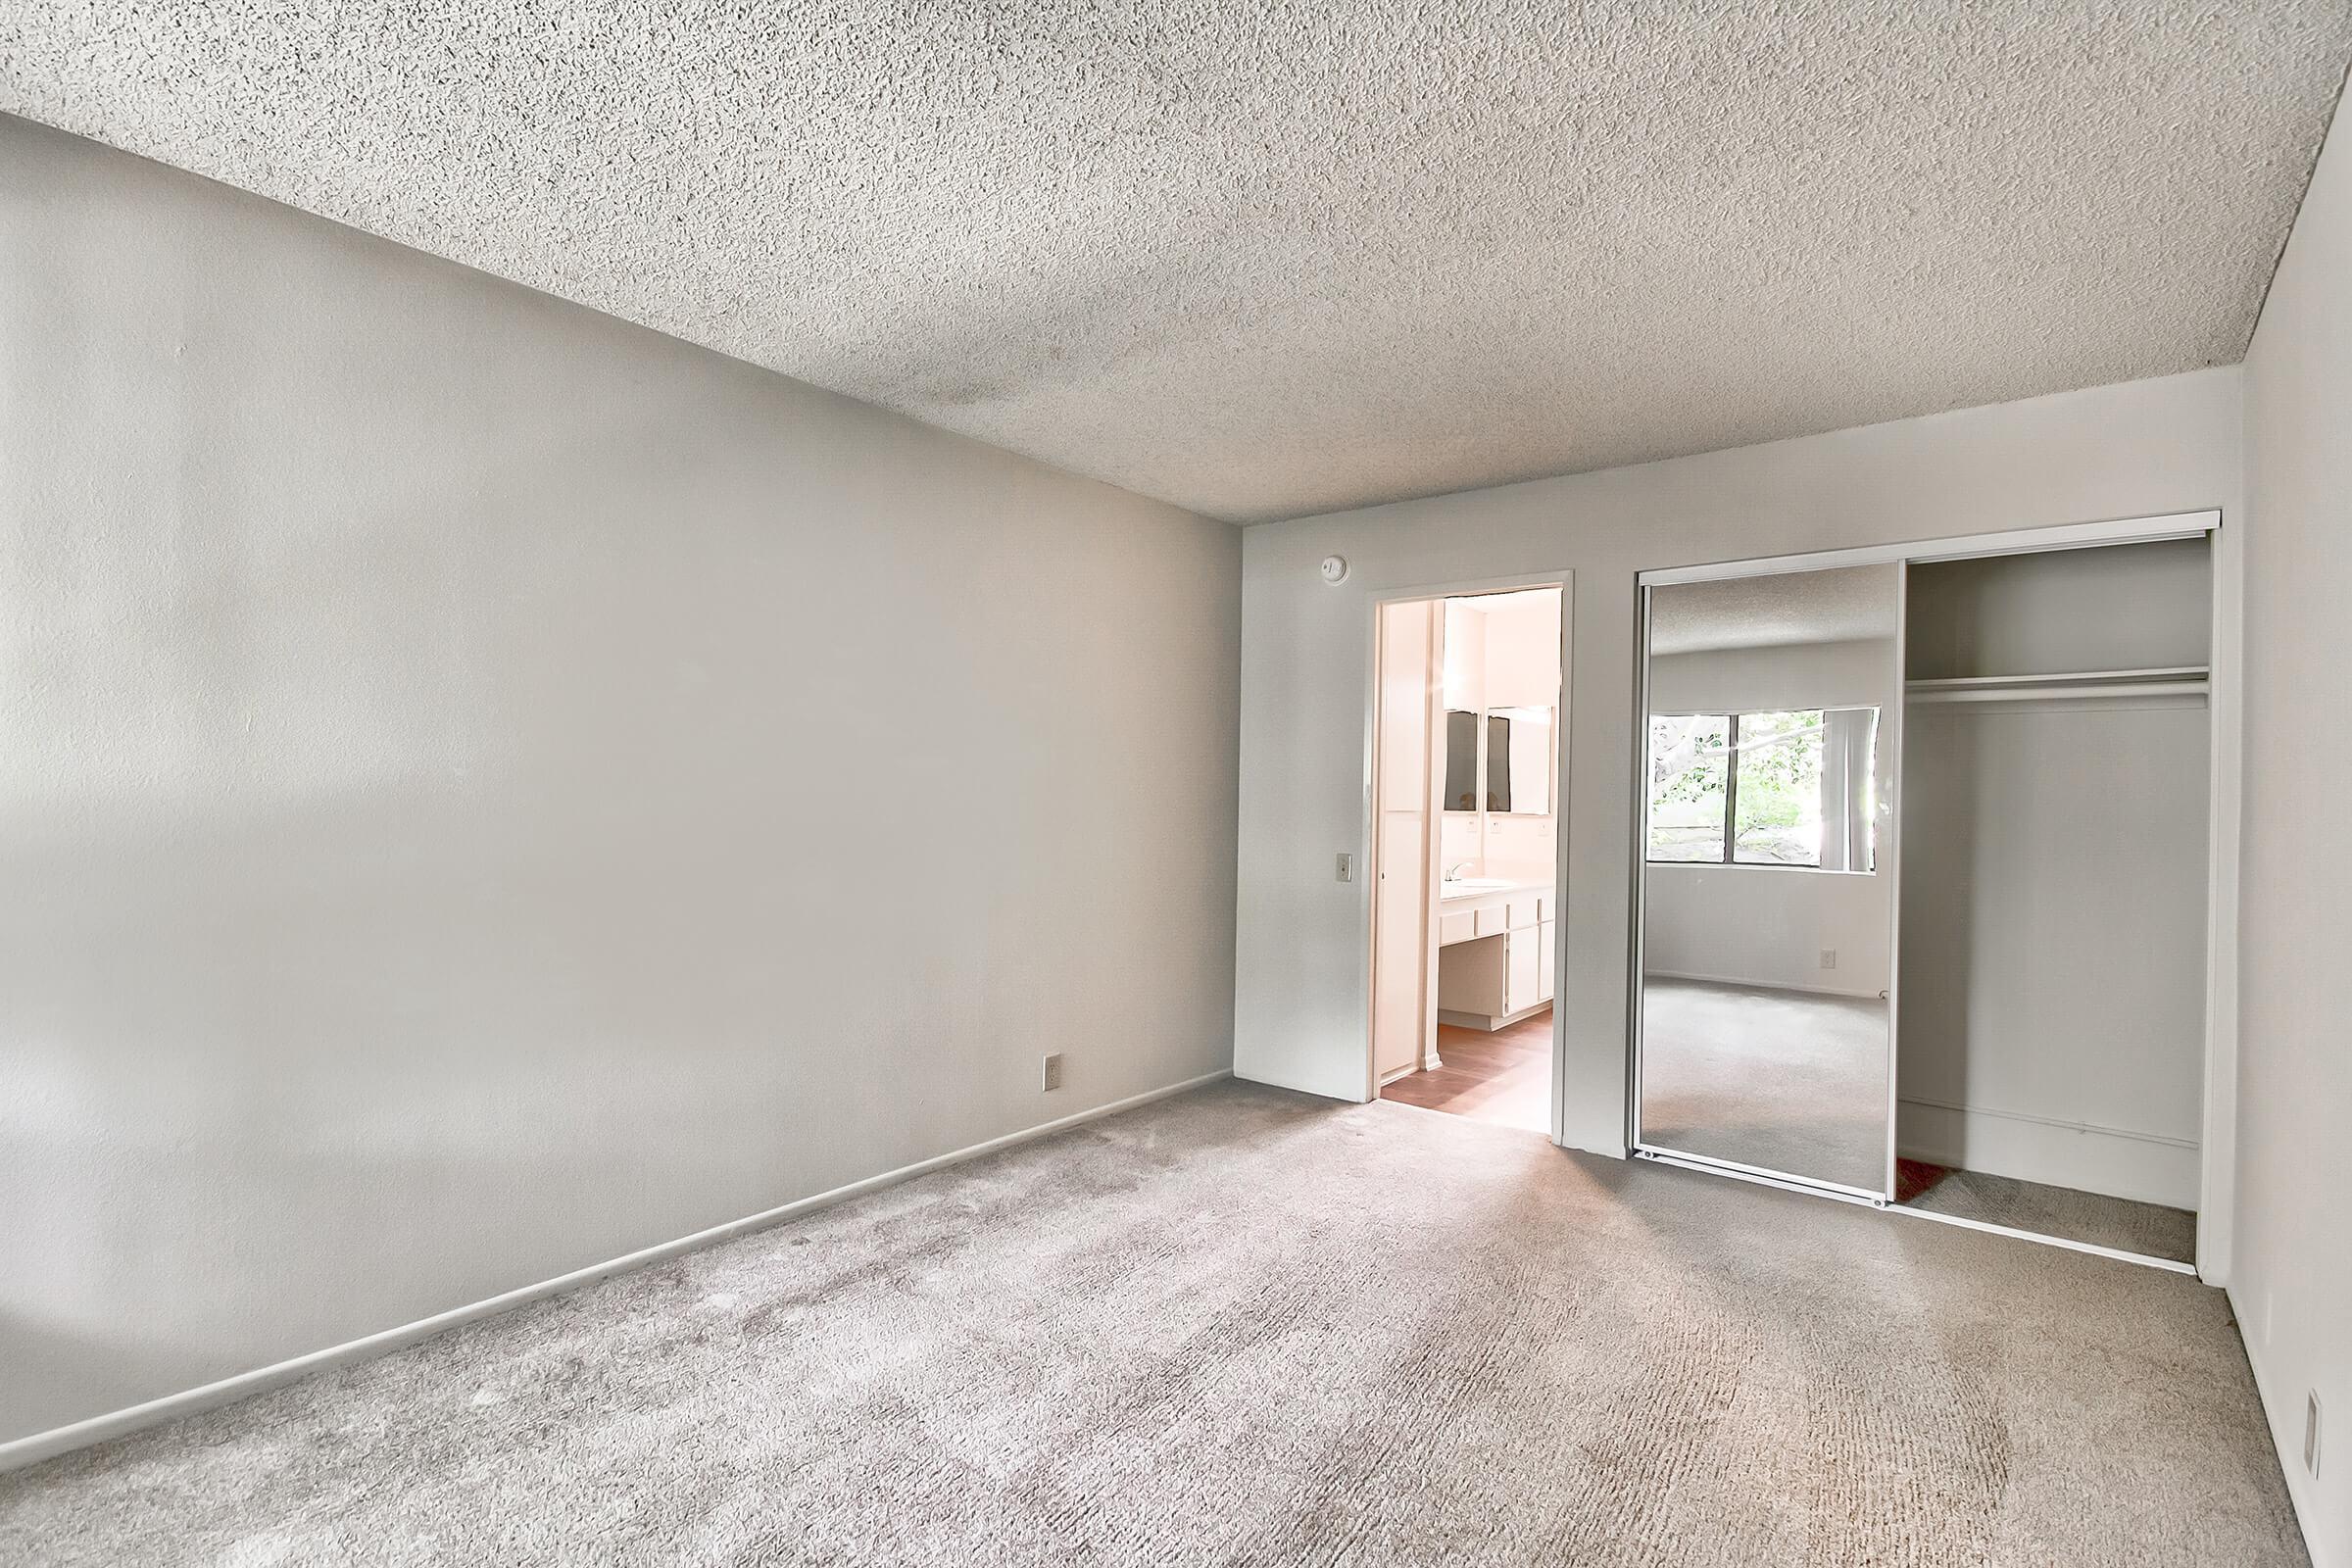 Bedroom_1207-21ST-AVE-NE-HICKORY-NC-28601-1872_HUNTINGTON-PARK-APTS_RPI_II-273044-54.jpg